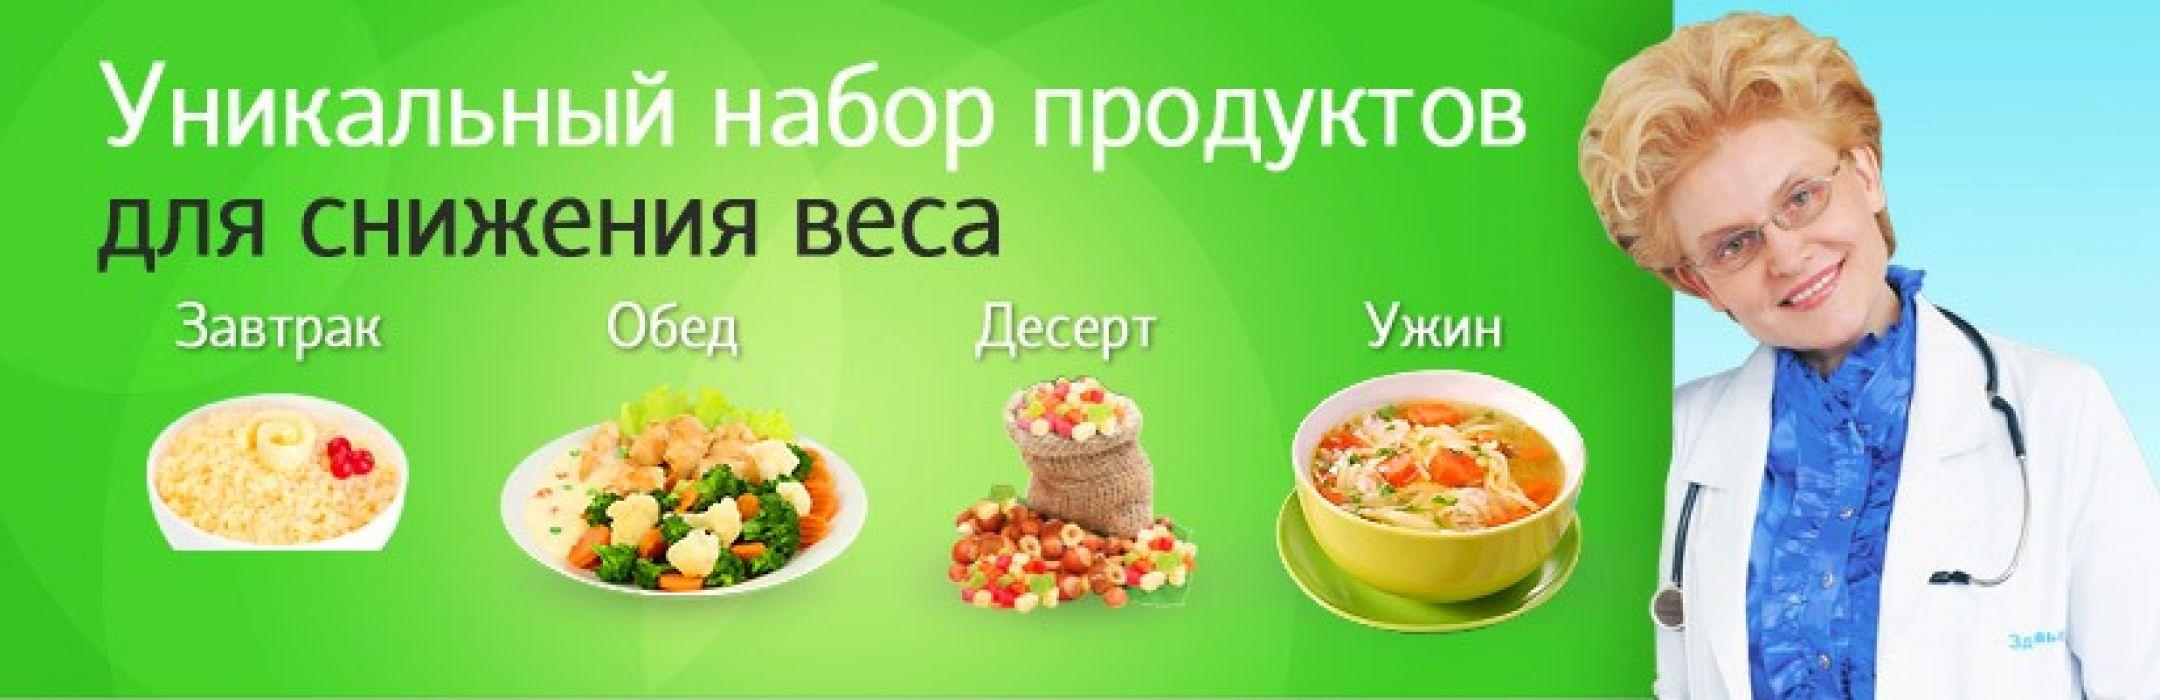 http://kkal.ru/wp-content/uploads/2016/02/7f9956a956acdab24e6269c760a62e8b.jpg